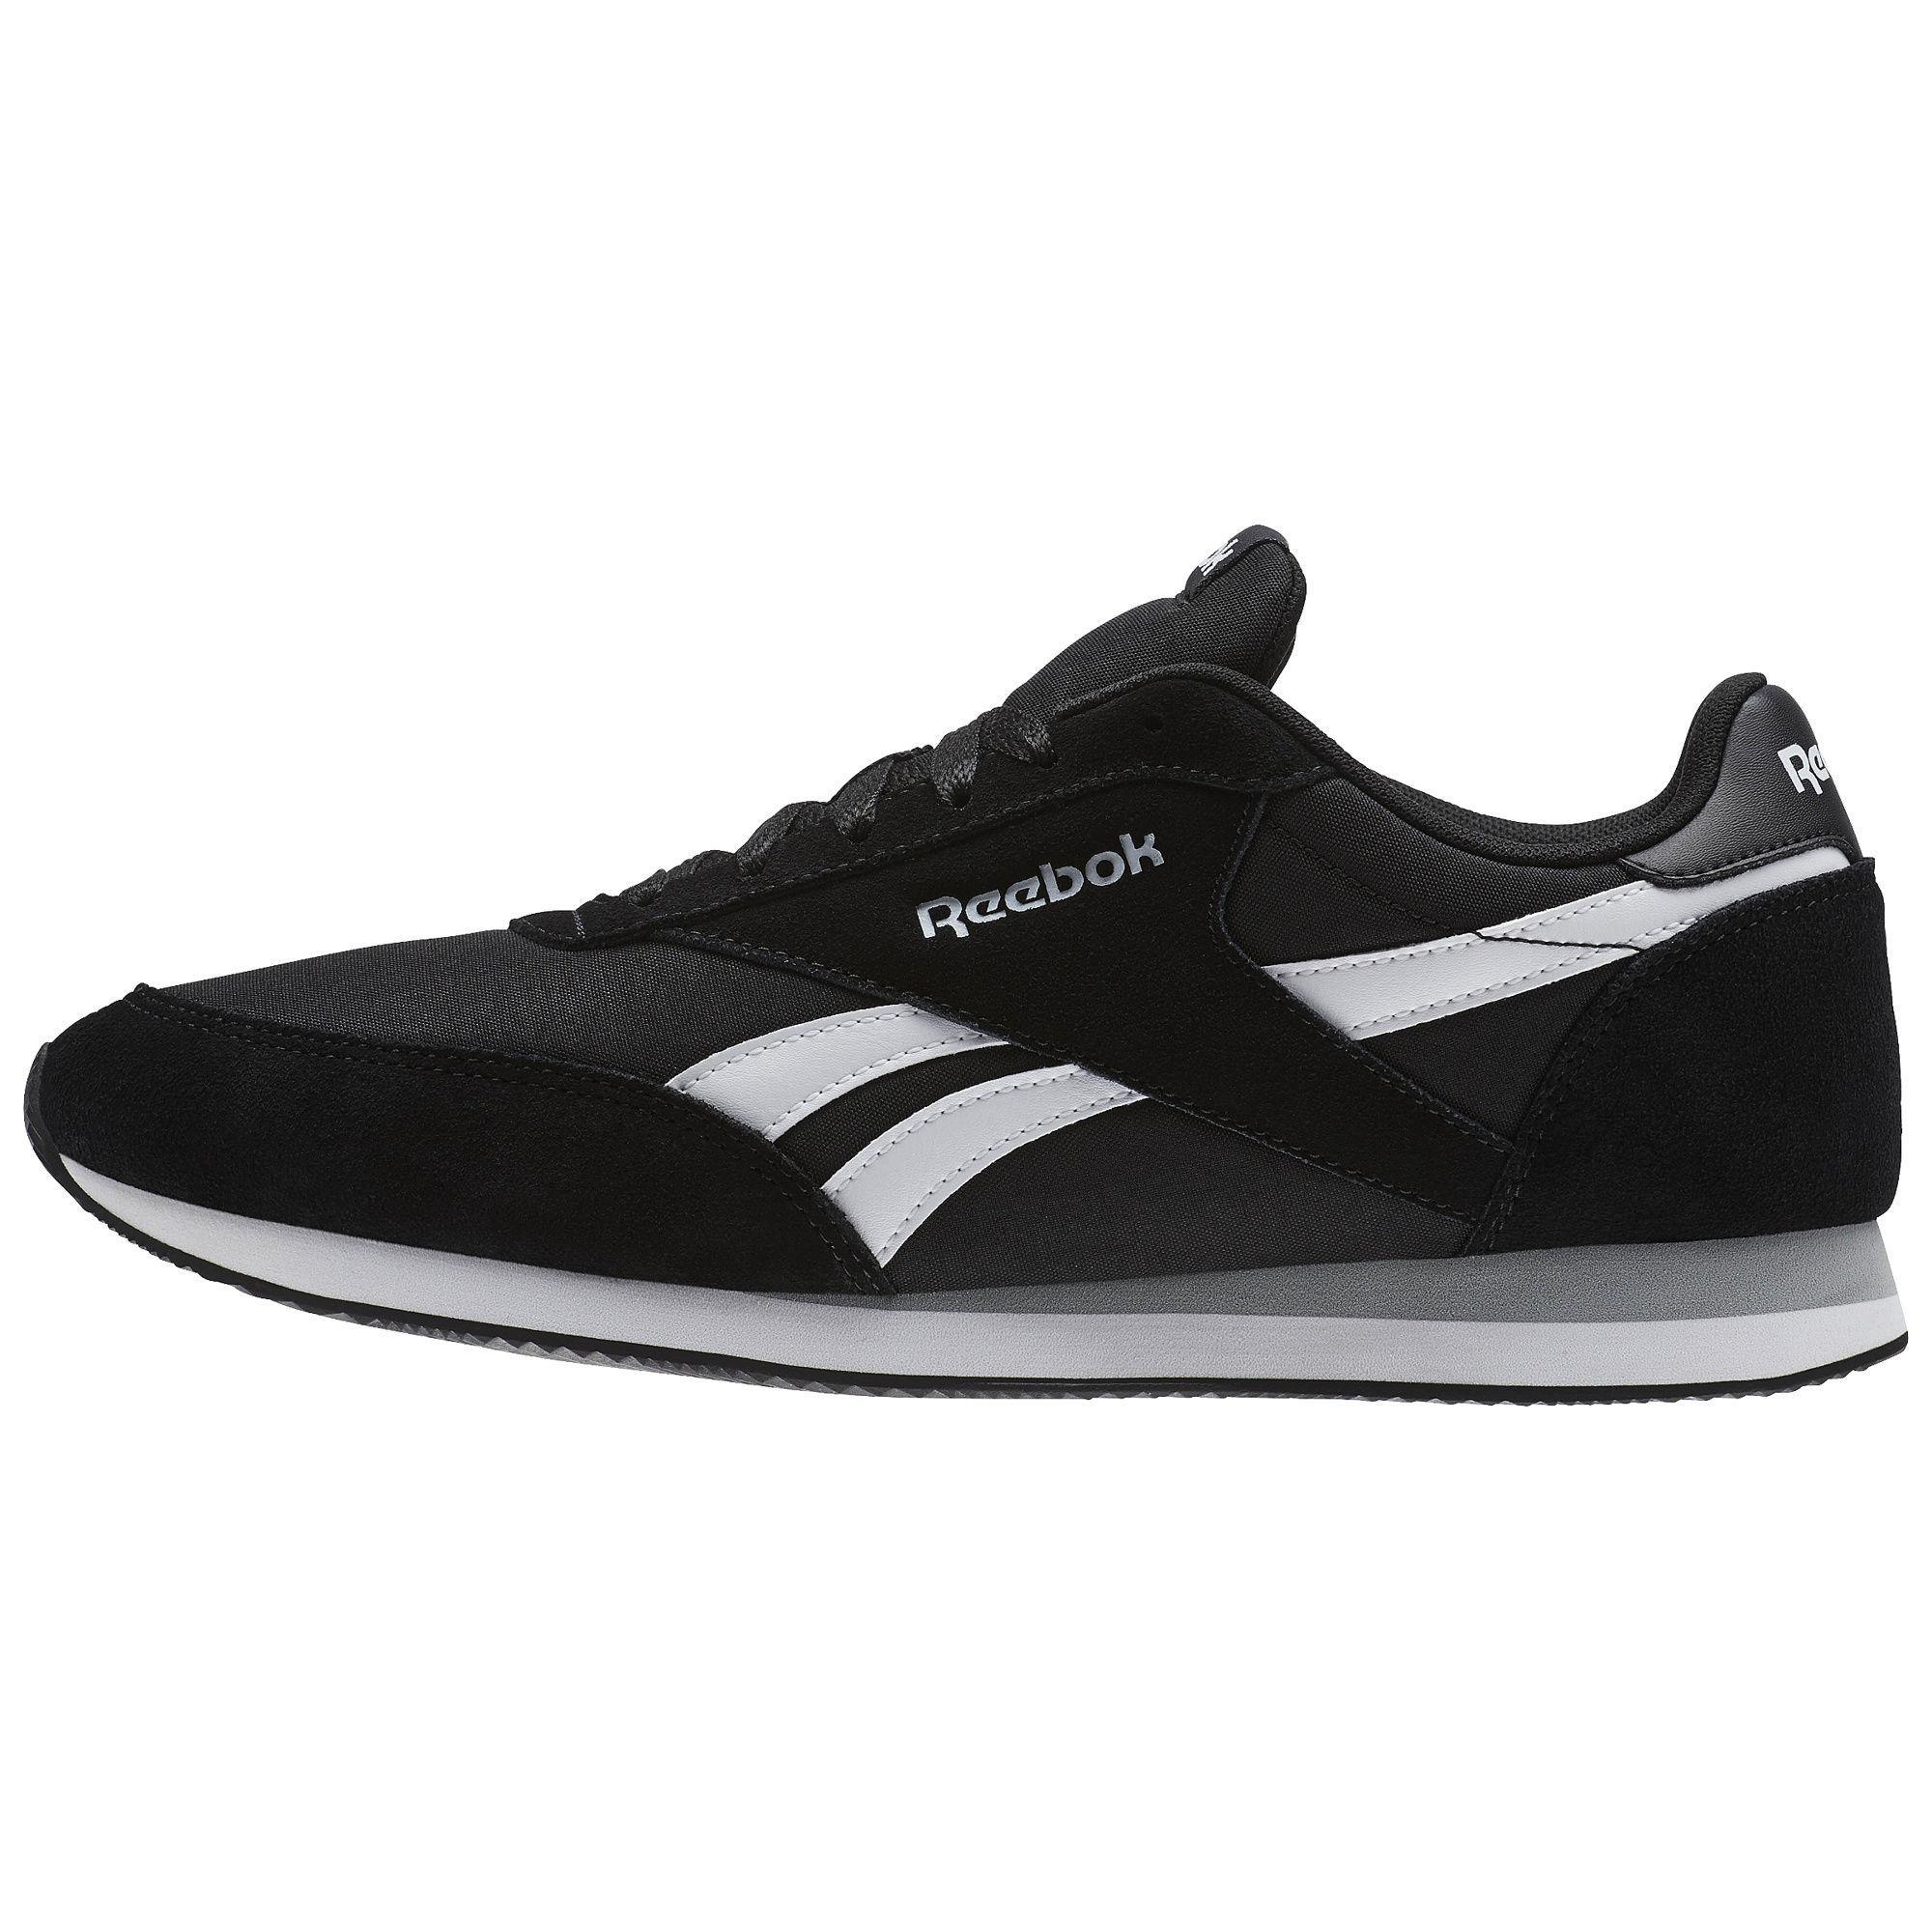 Sneaker 2 Jogger Classic Royal Reebok Herren von Schuhe